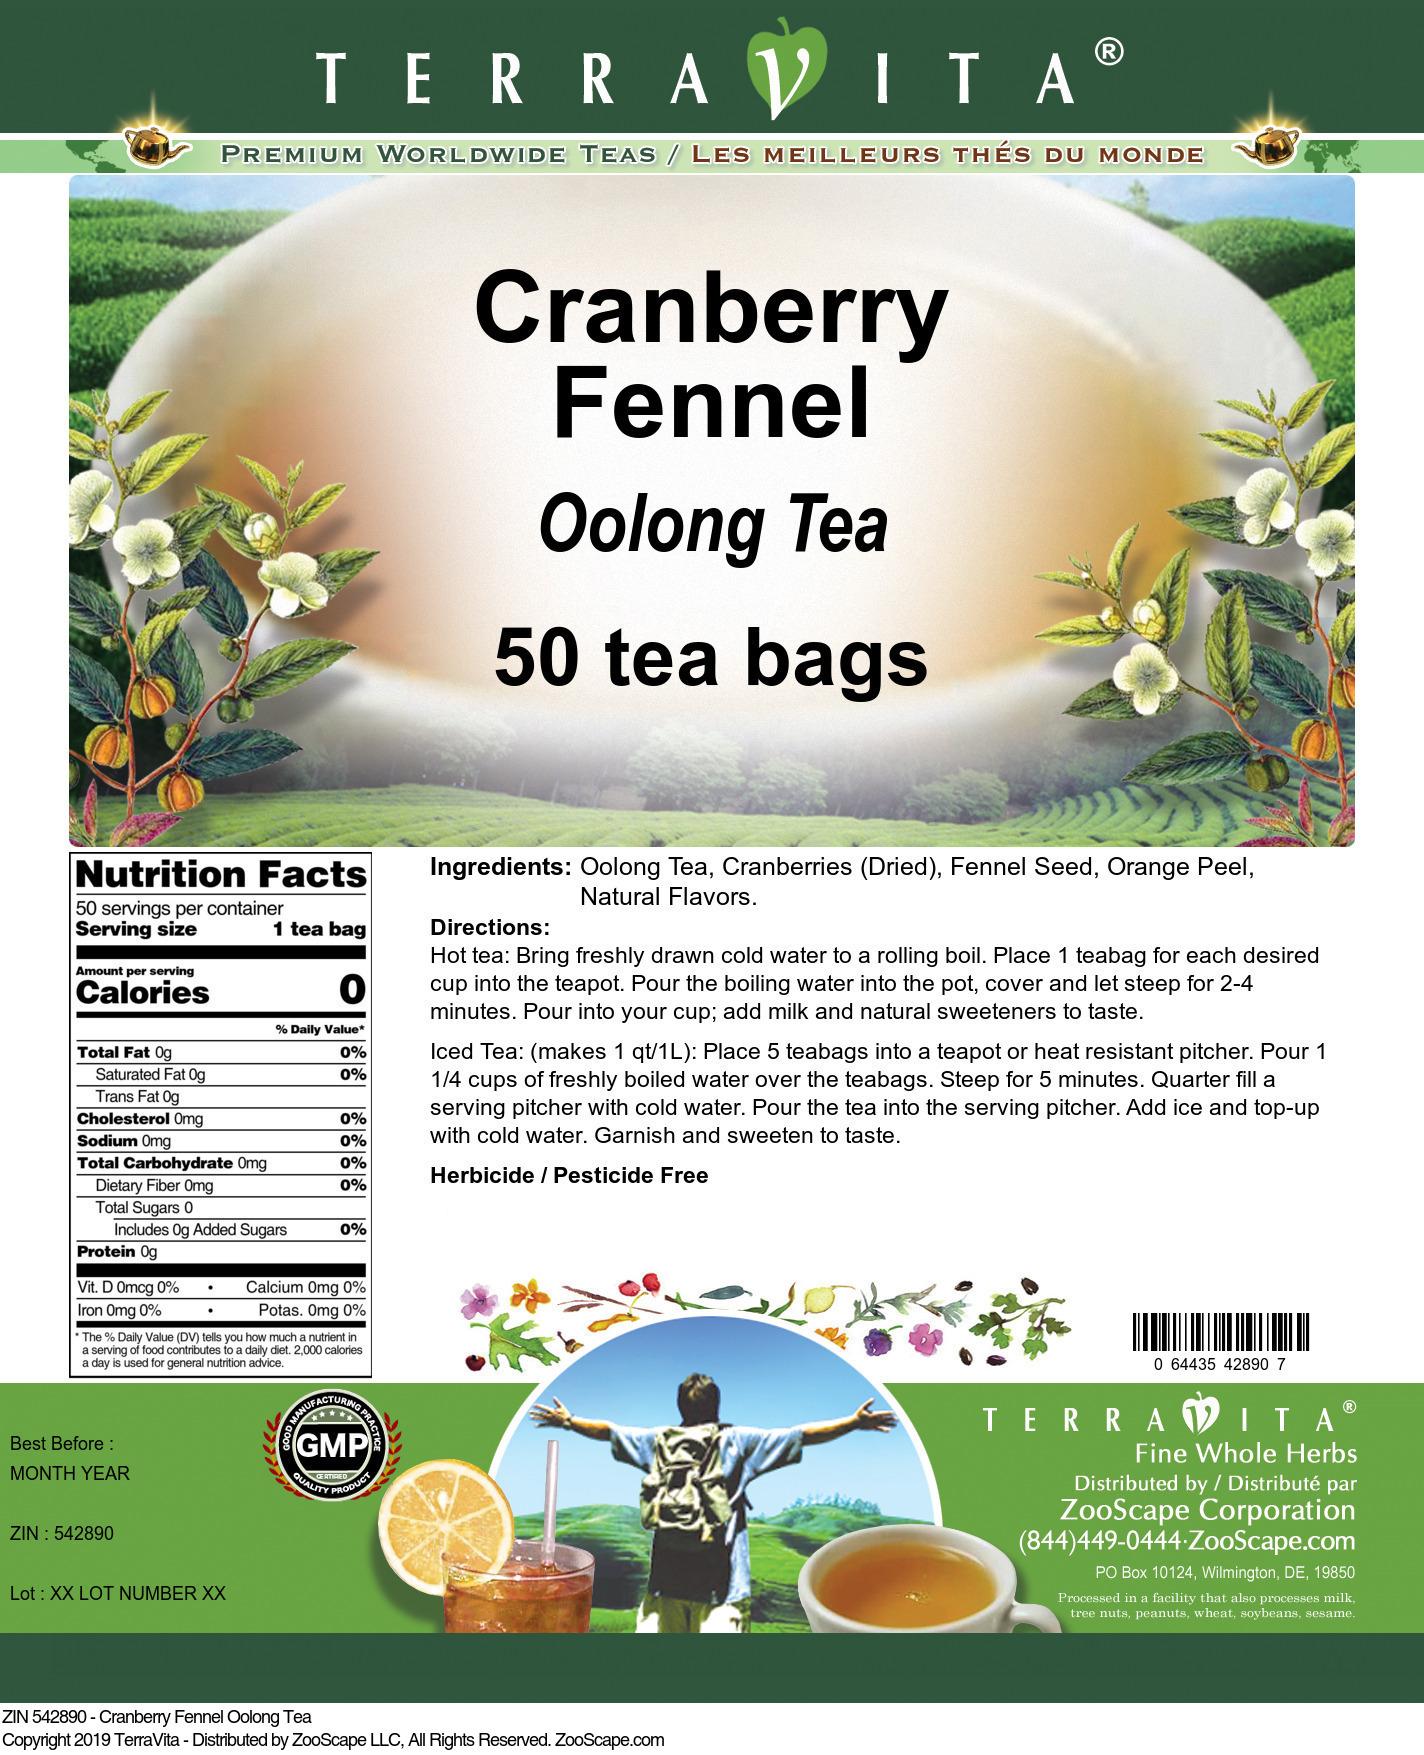 Cranberry Fennel Oolong Tea